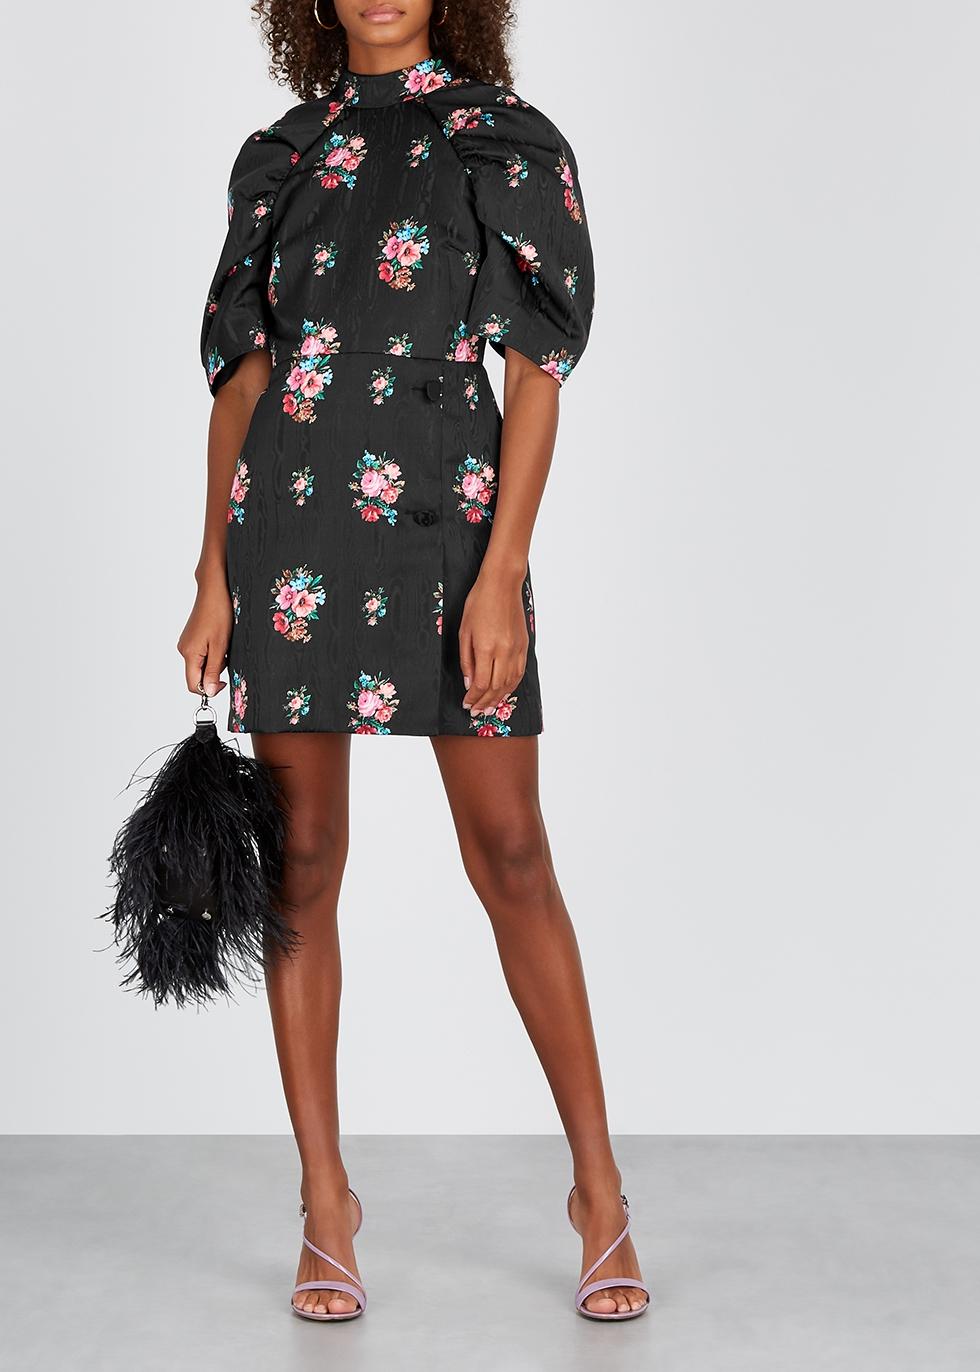 a89540a8 New In - Latest Fashion & Designer Brands - Harvey Nichols